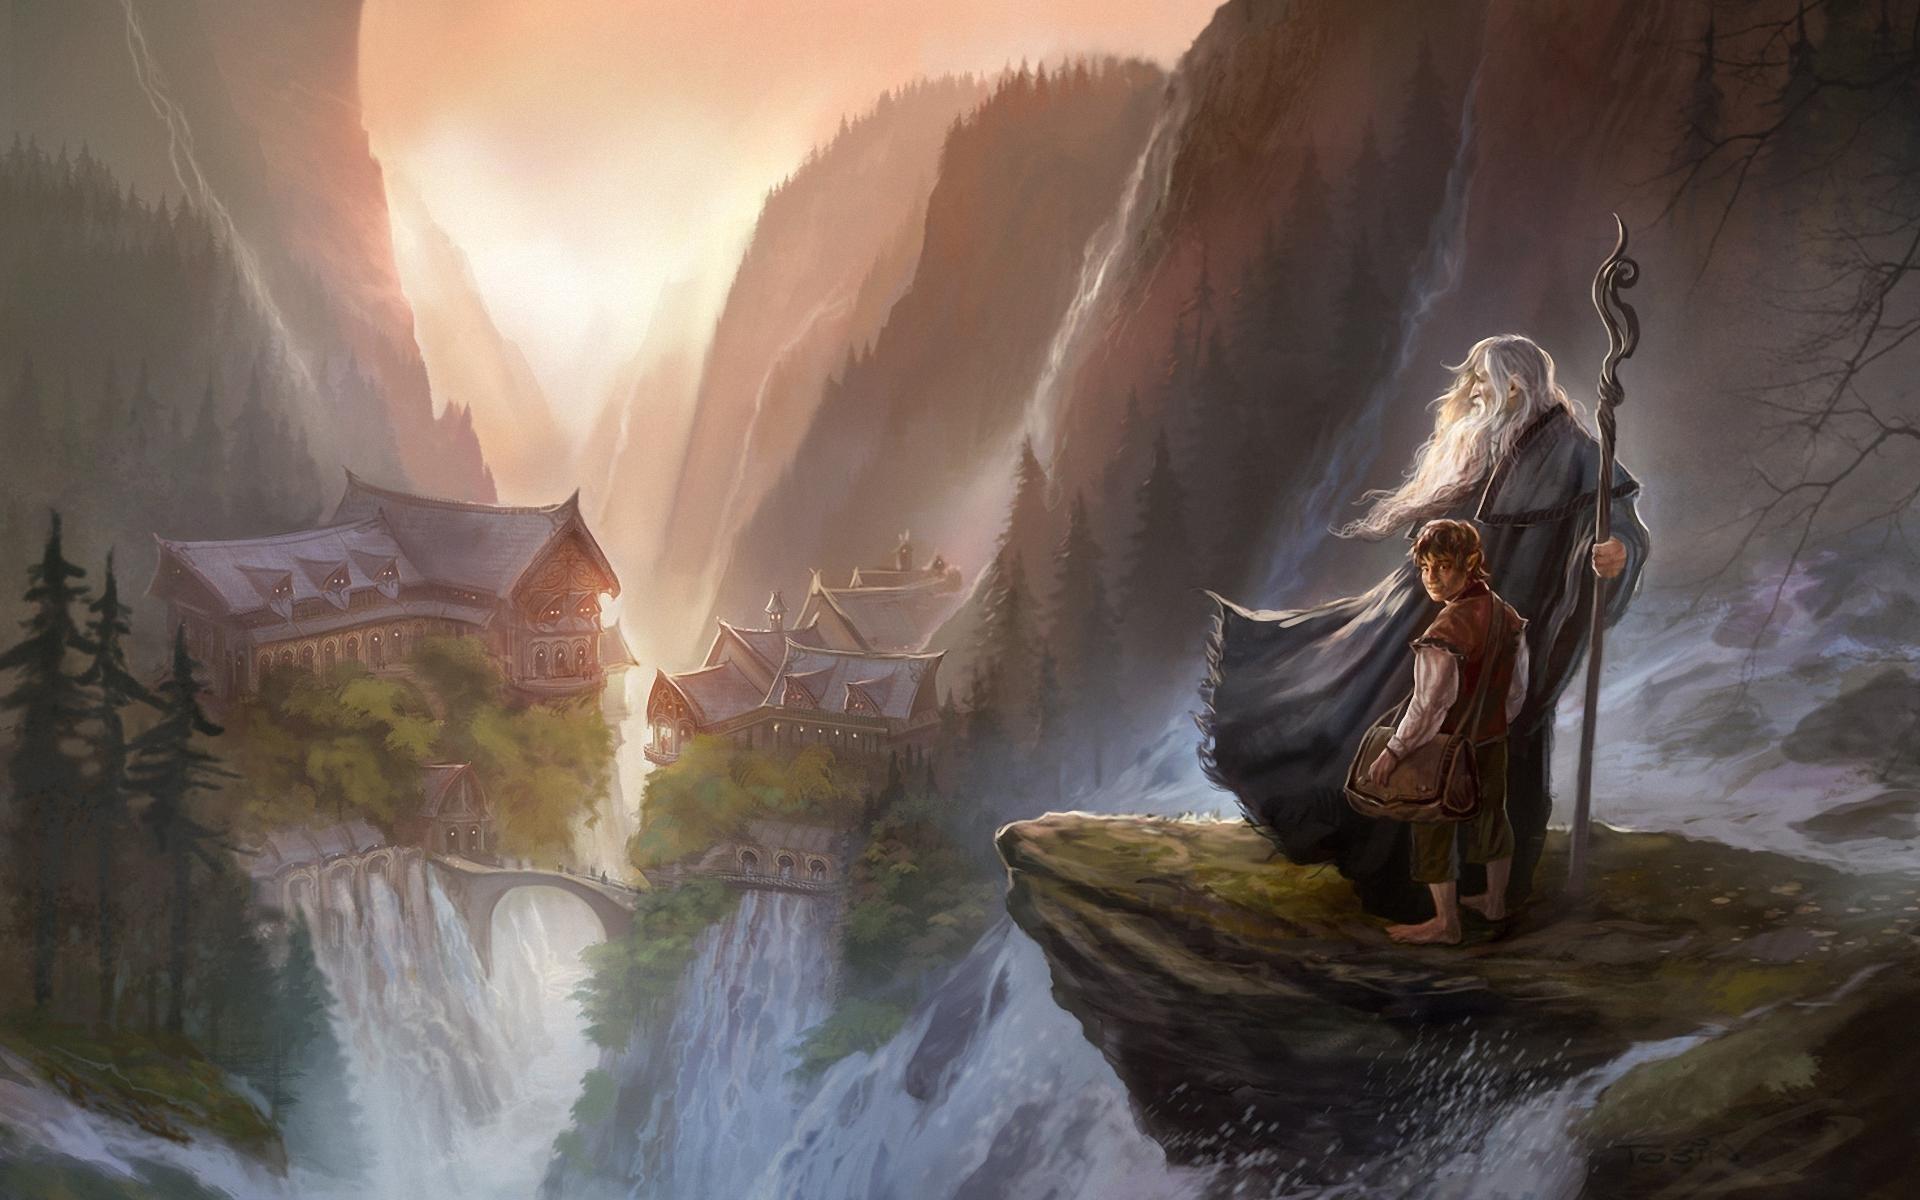 #bilbo Baggins, #the Hobbit, #digital Art, #painting, - Lord Of The Rings Digital Art , HD Wallpaper & Backgrounds